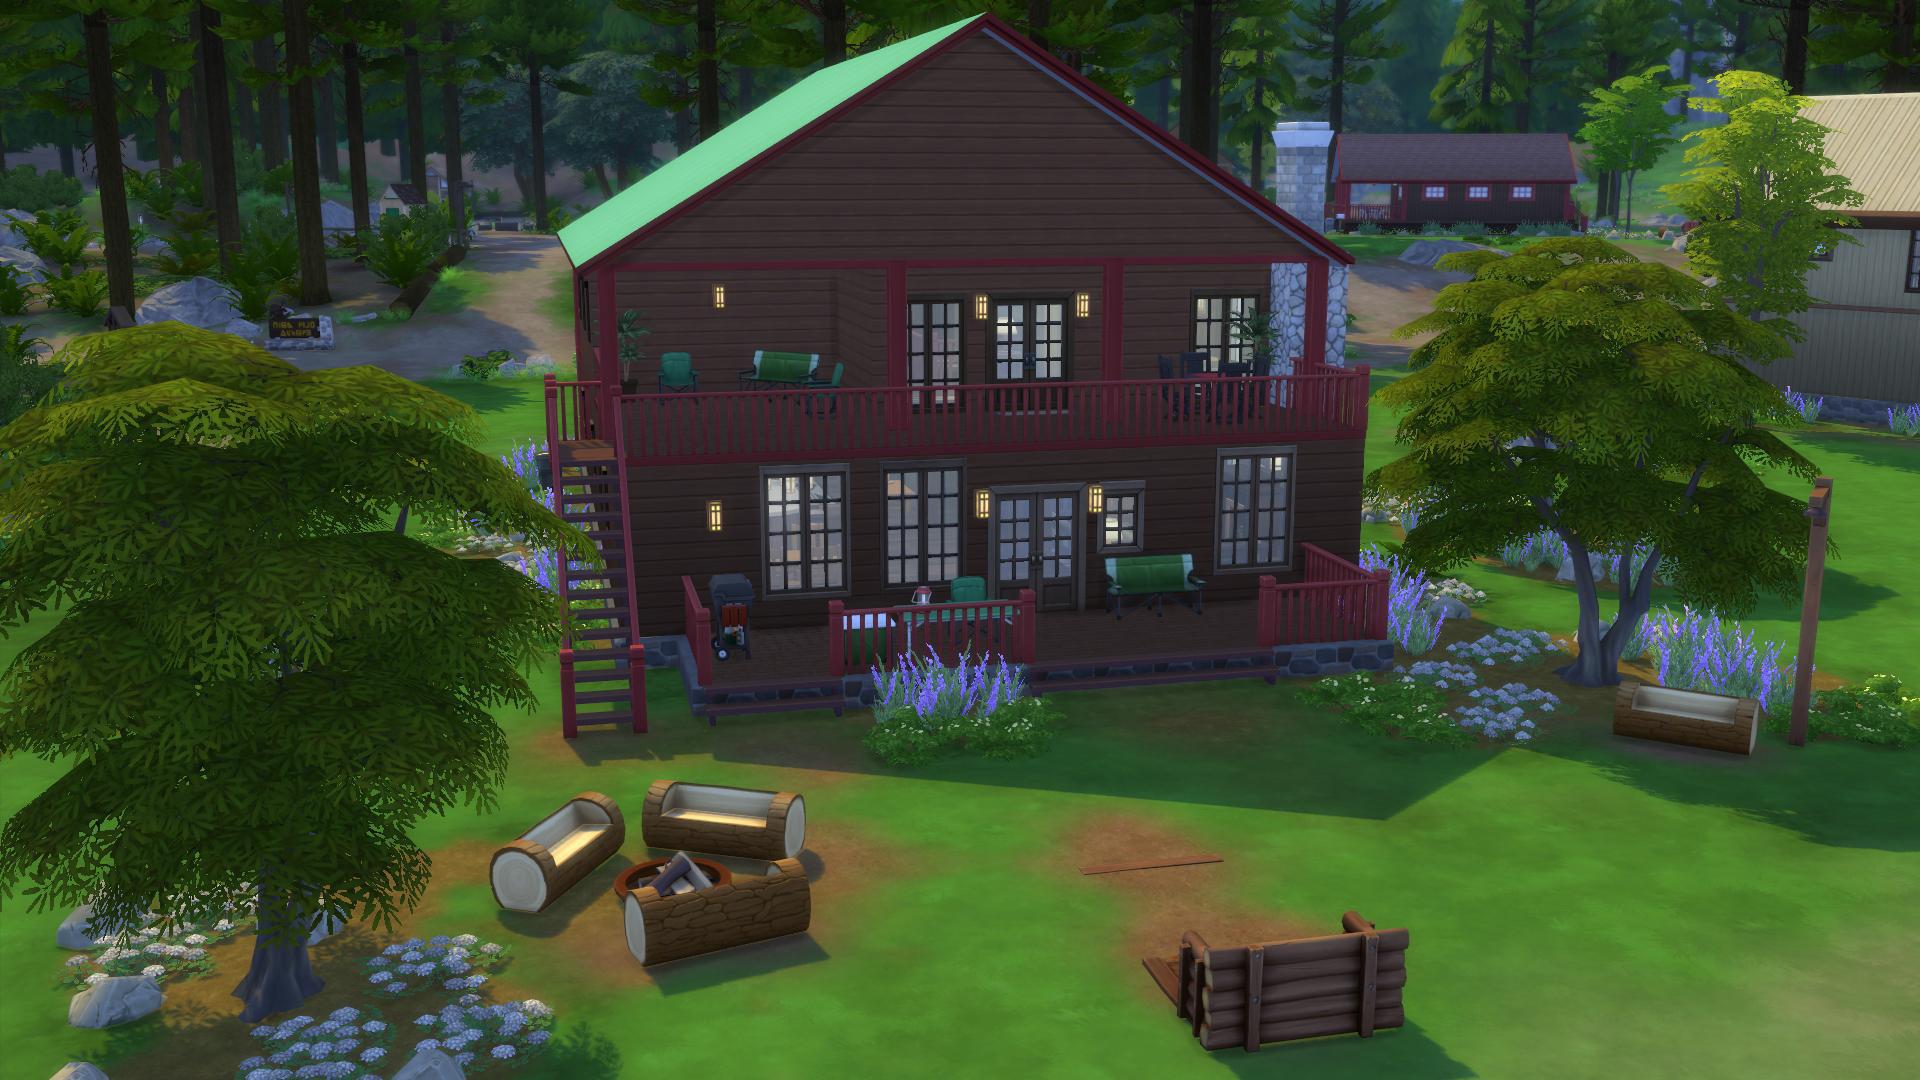 die sims 4 outdoor leben simtimes. Black Bedroom Furniture Sets. Home Design Ideas